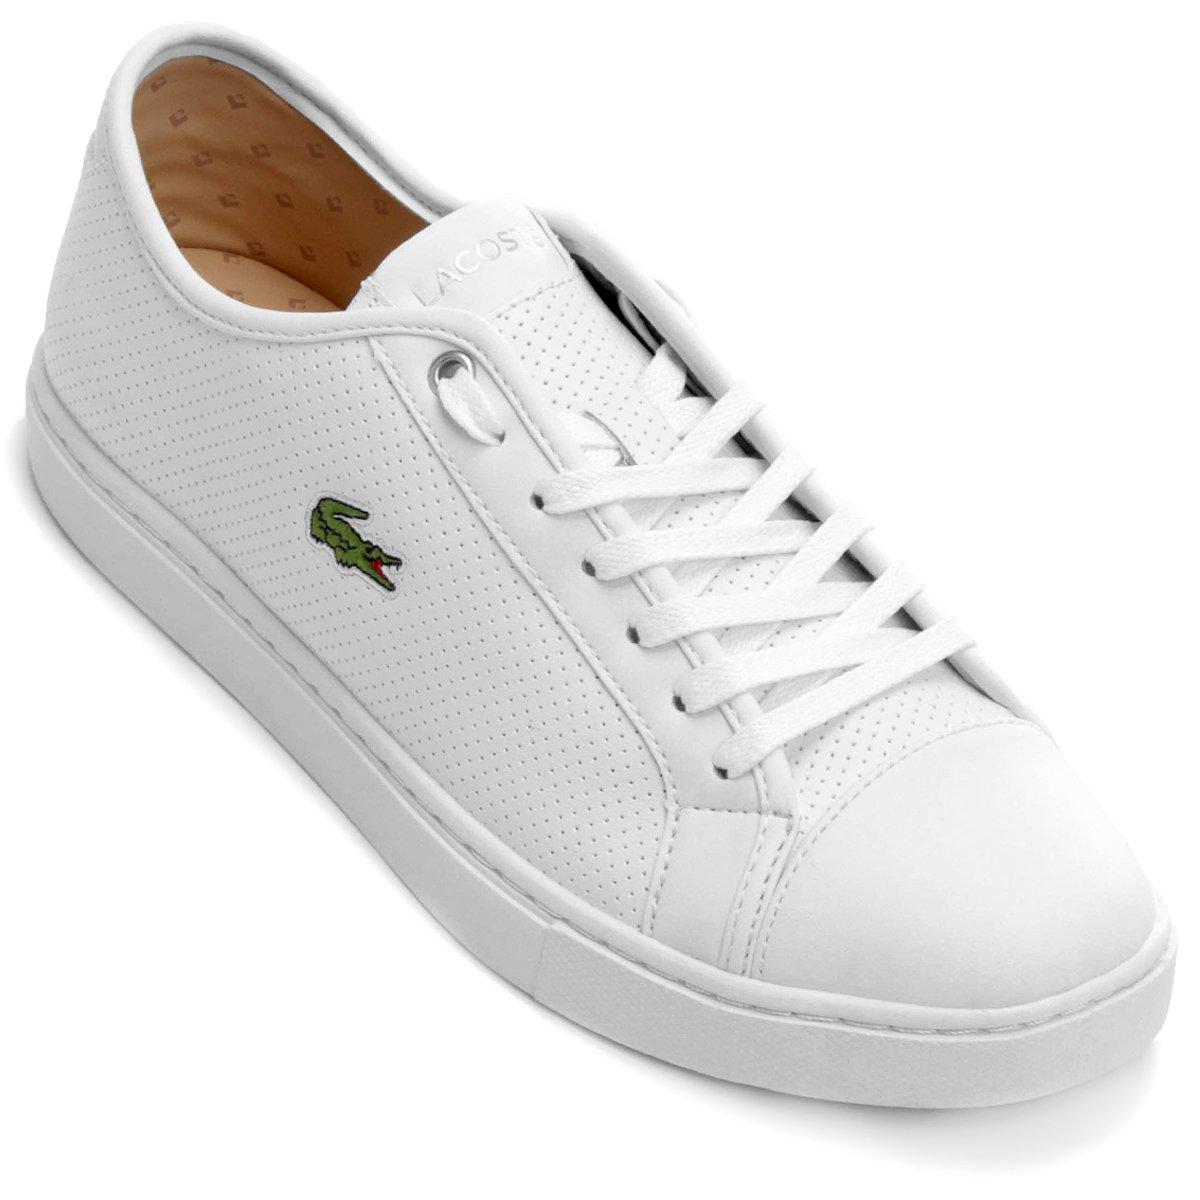 Tênis Lacoste Showcourt Piq3 - Compre Agora   Netshoes f0c1a17318